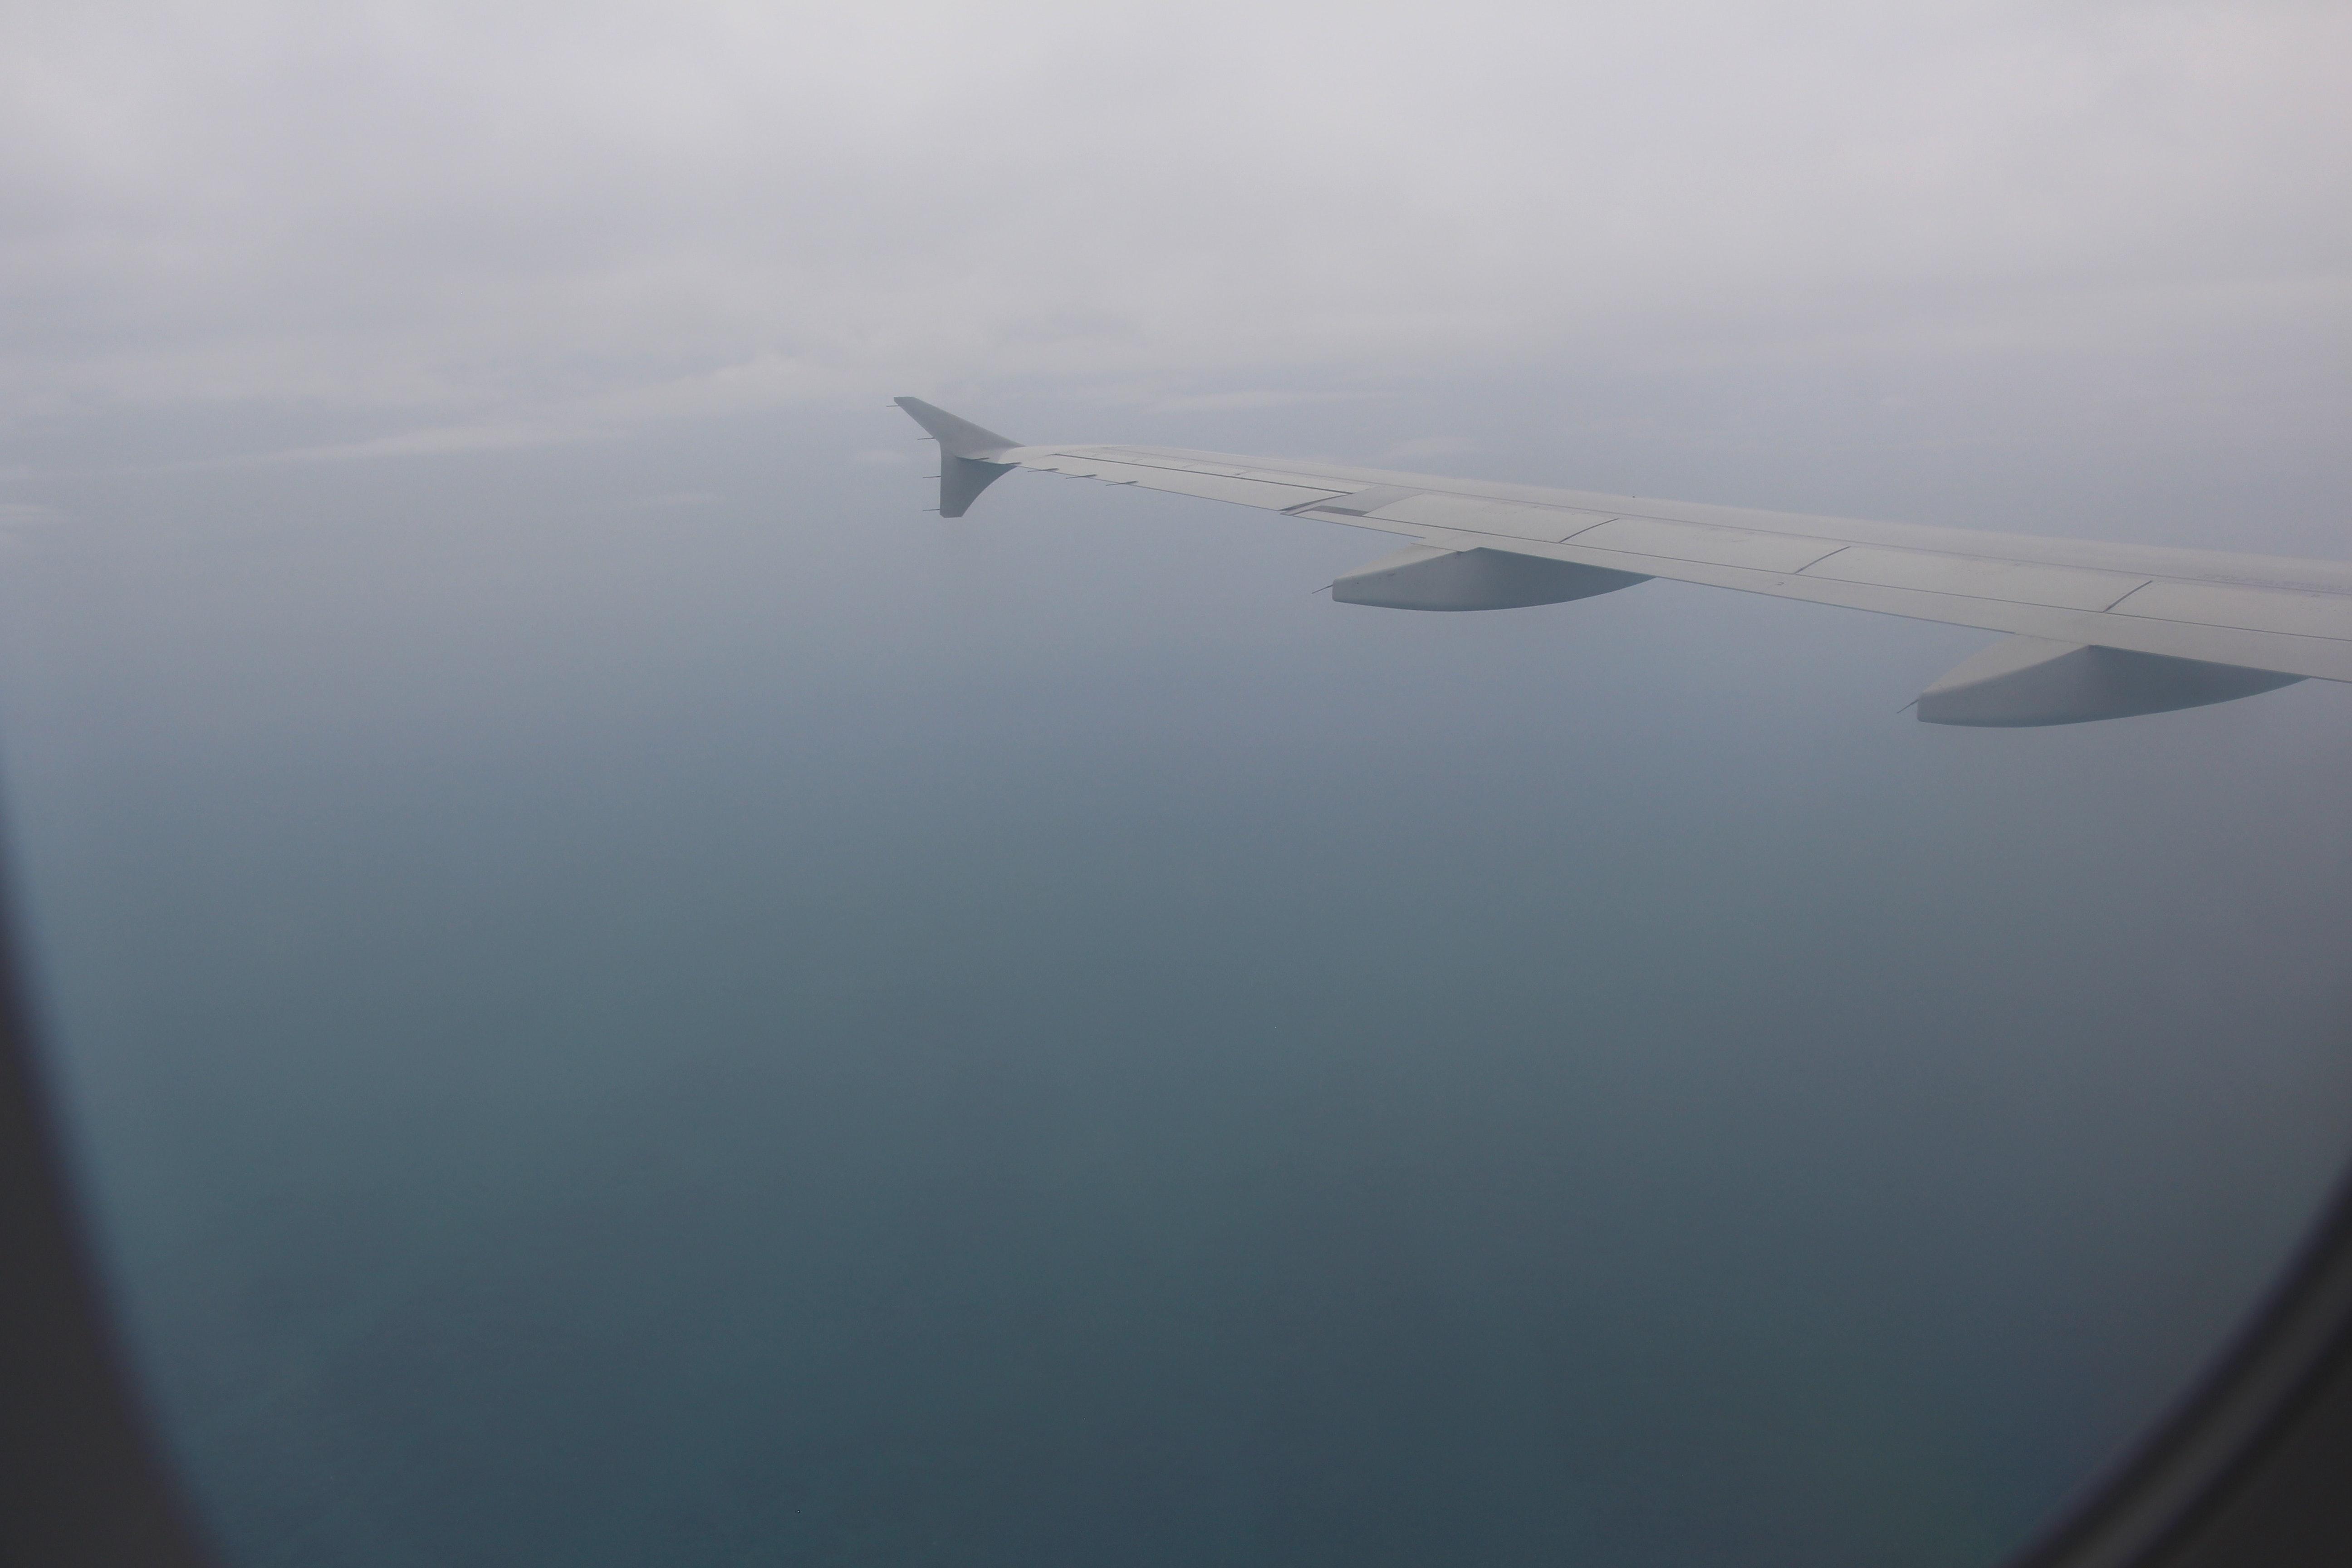 Free stock photo of aircraft, aircraft window, aircraft wing